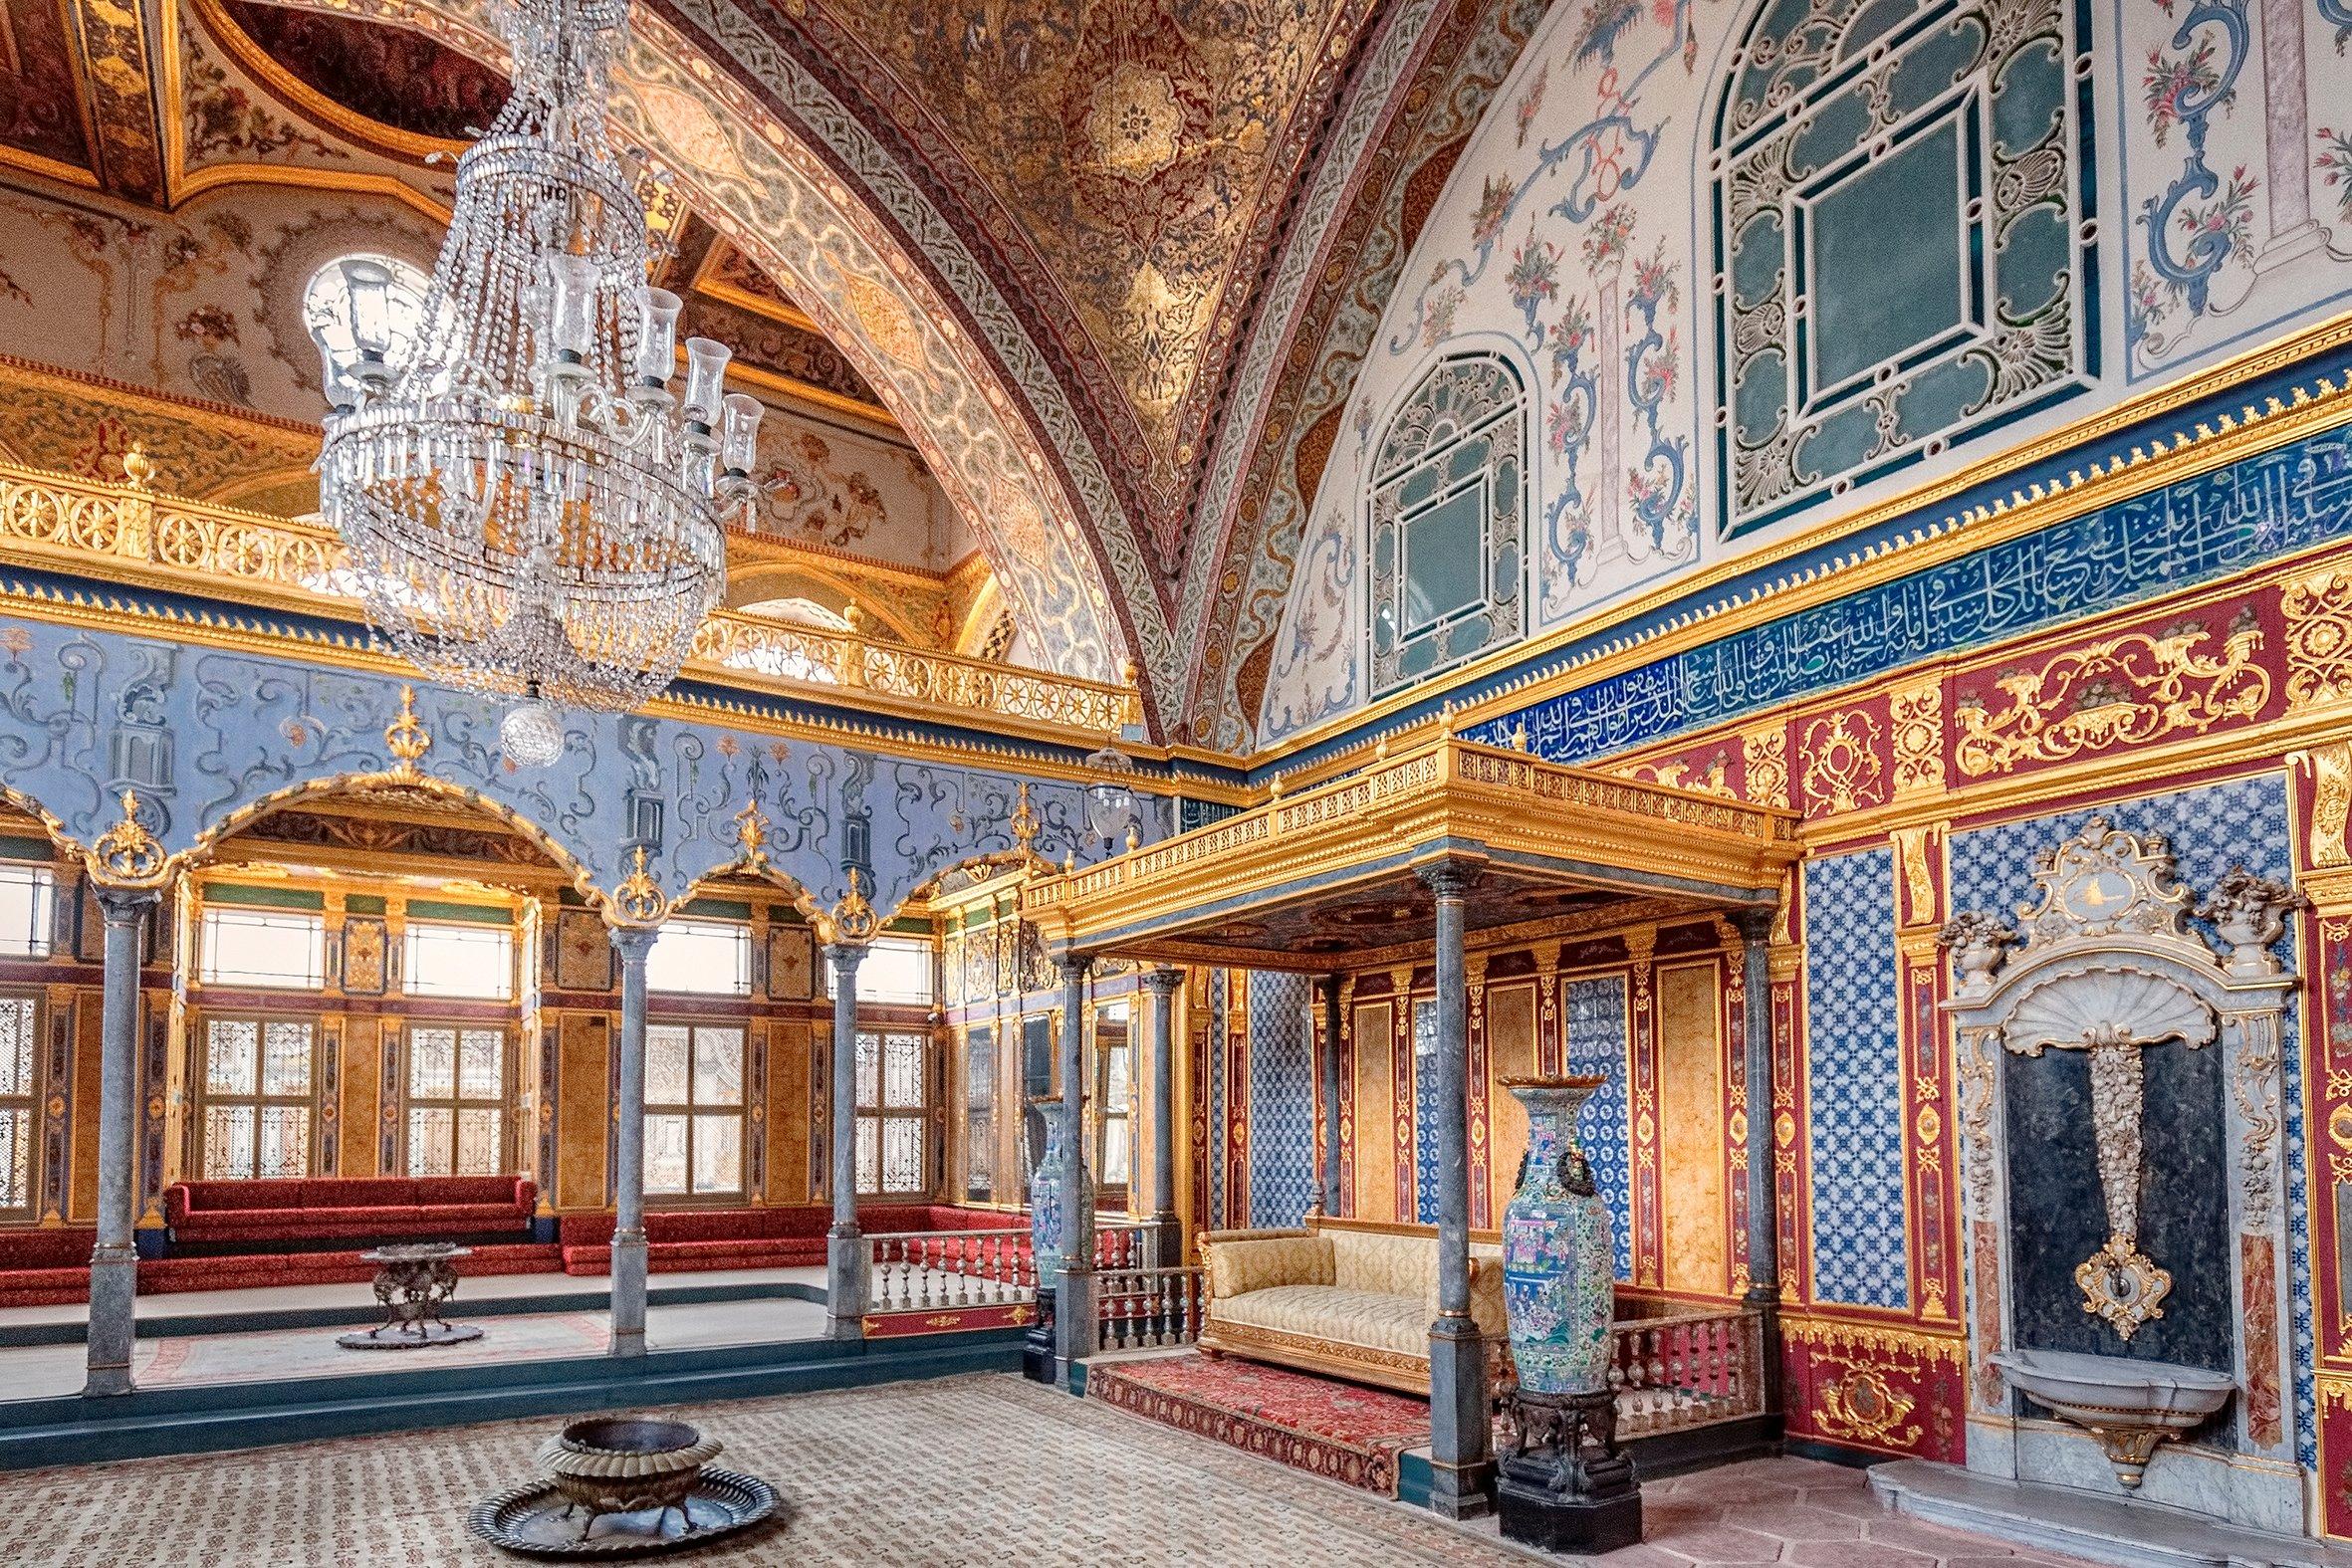 A photo from the interior of Topkapı Palace. (Ruslan Kaln / iStock Photo)